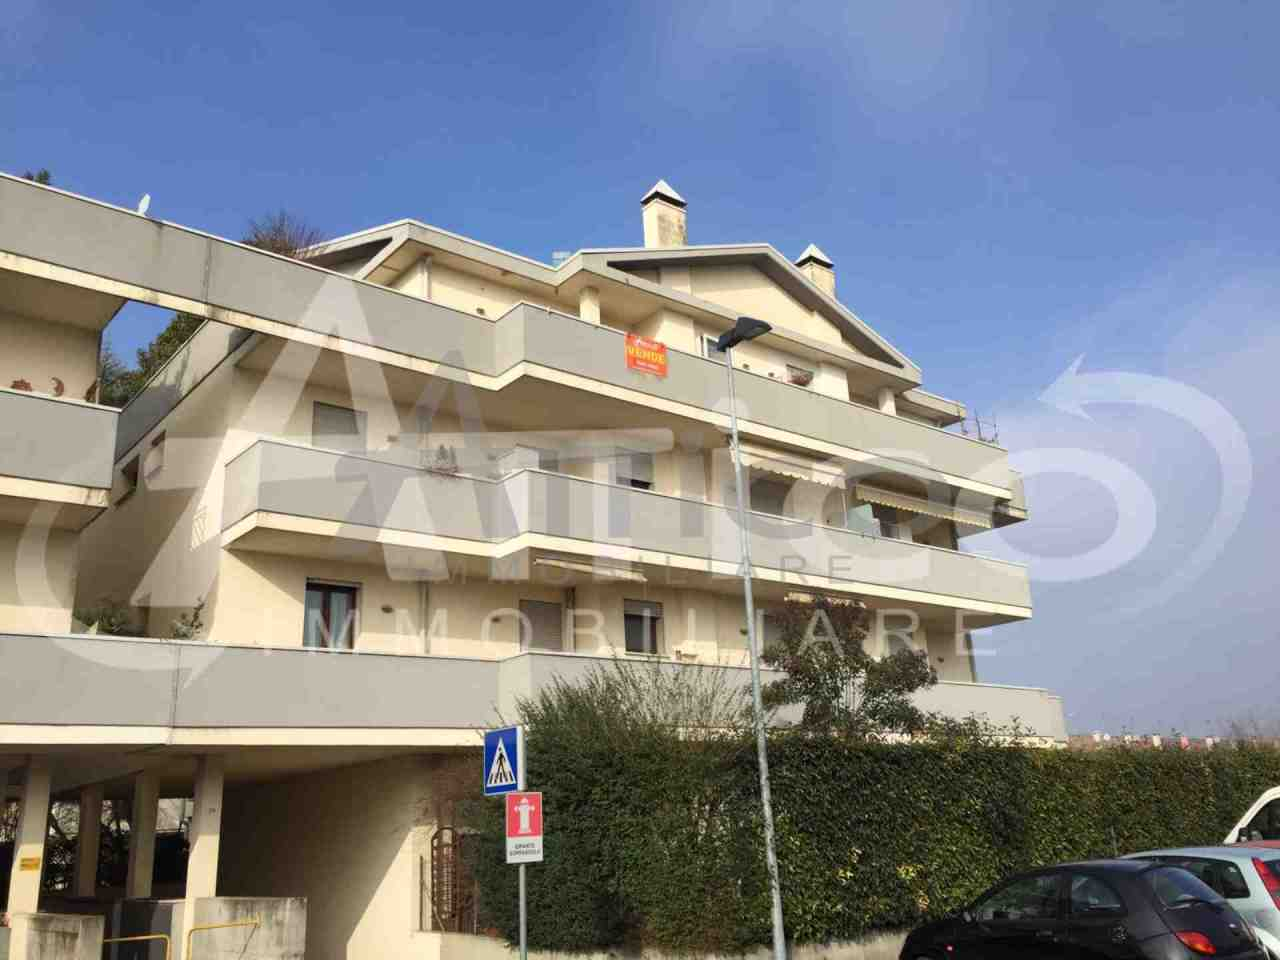 Locale commerciale - 2 Vetrine a Tassina, Rovigo Rif. 4169540